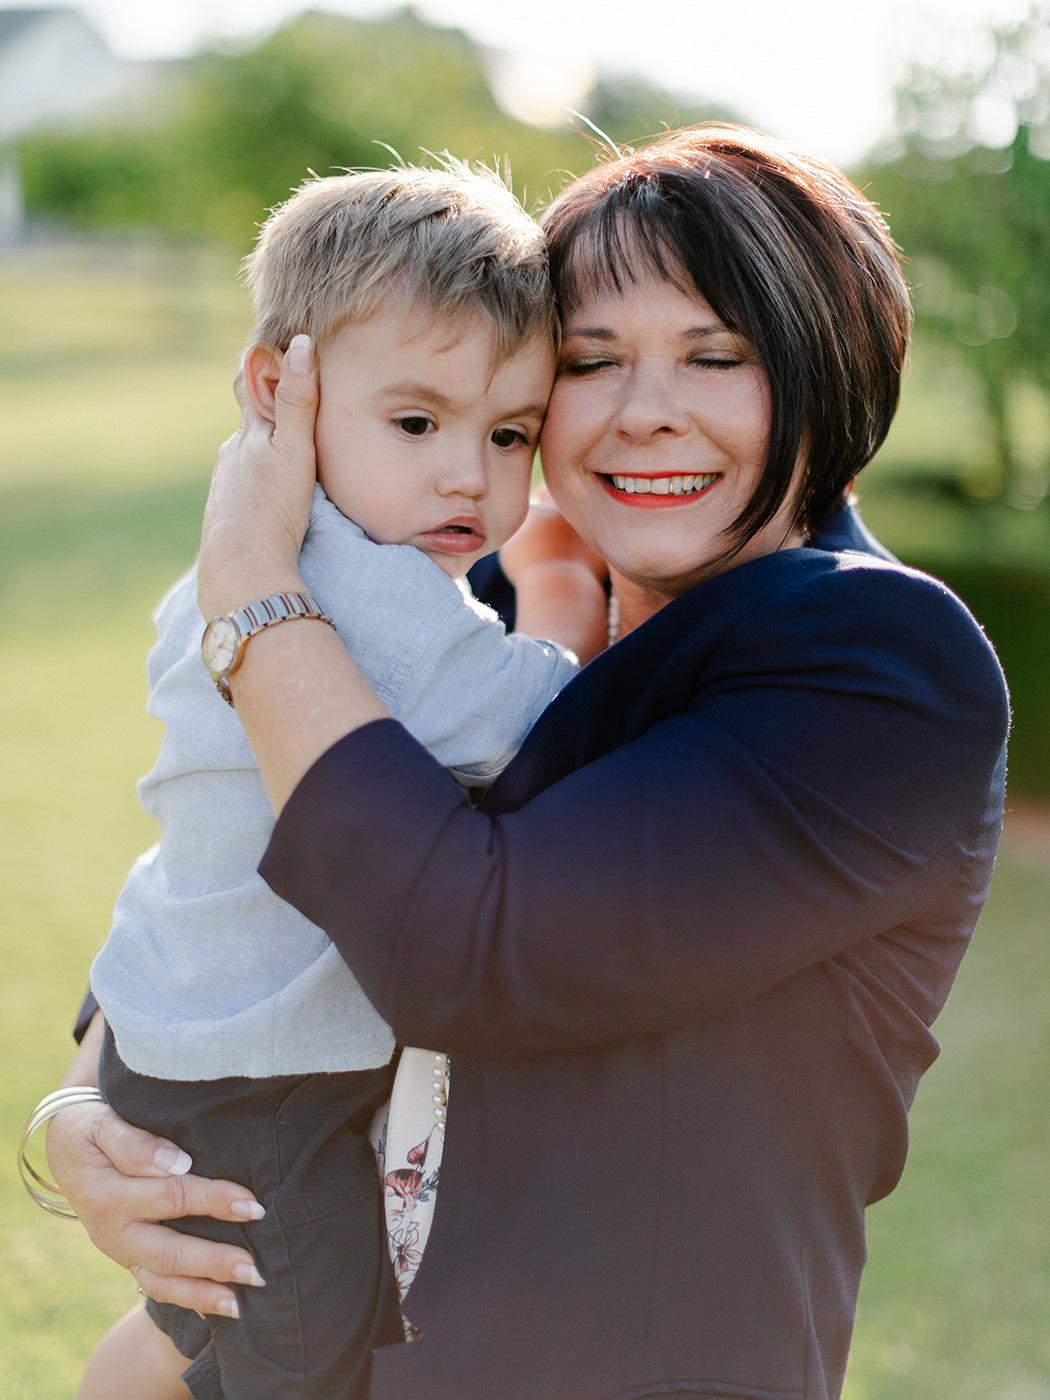 Grand mother & son | Rensche Mari